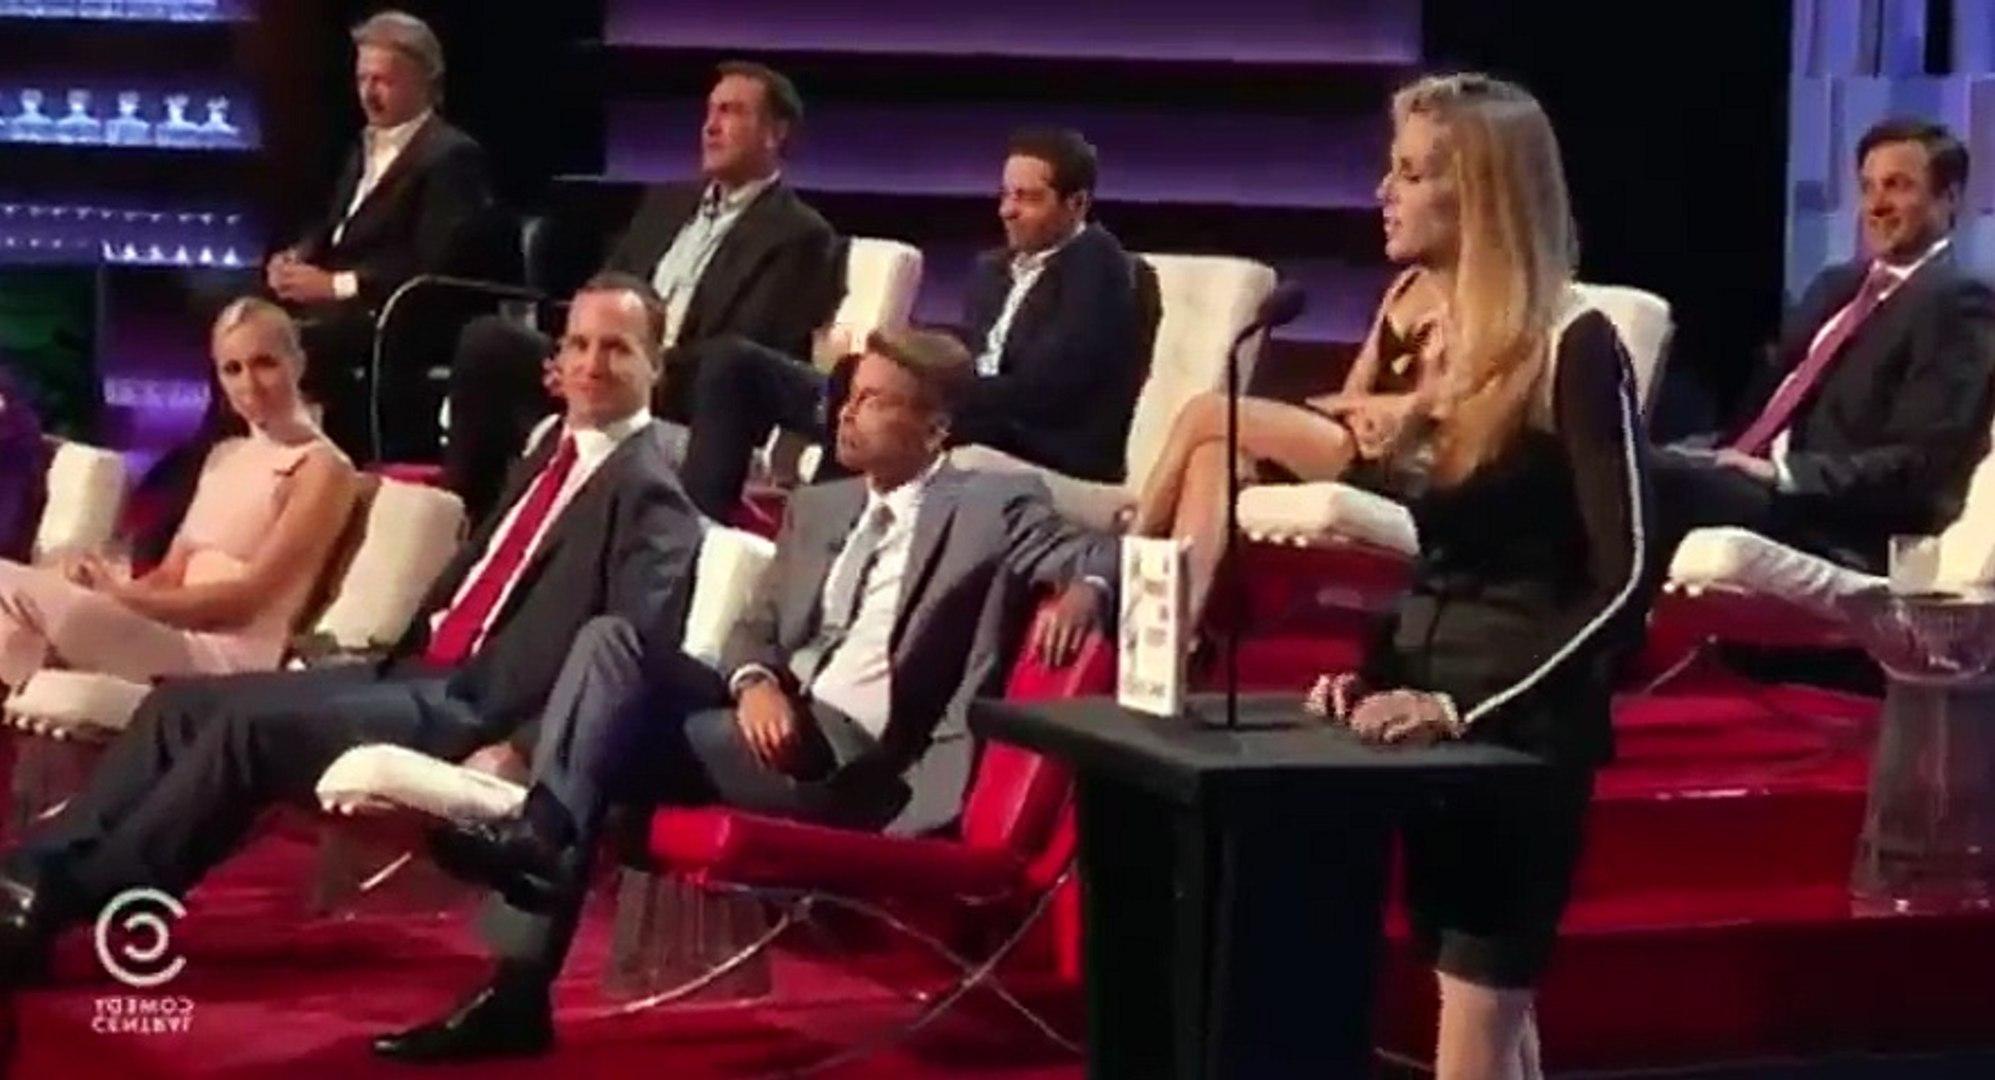 Comedy Central Roast S02 - Ep01 Comedy Central Roast of Rob Lowe - Part 02 HD Watch